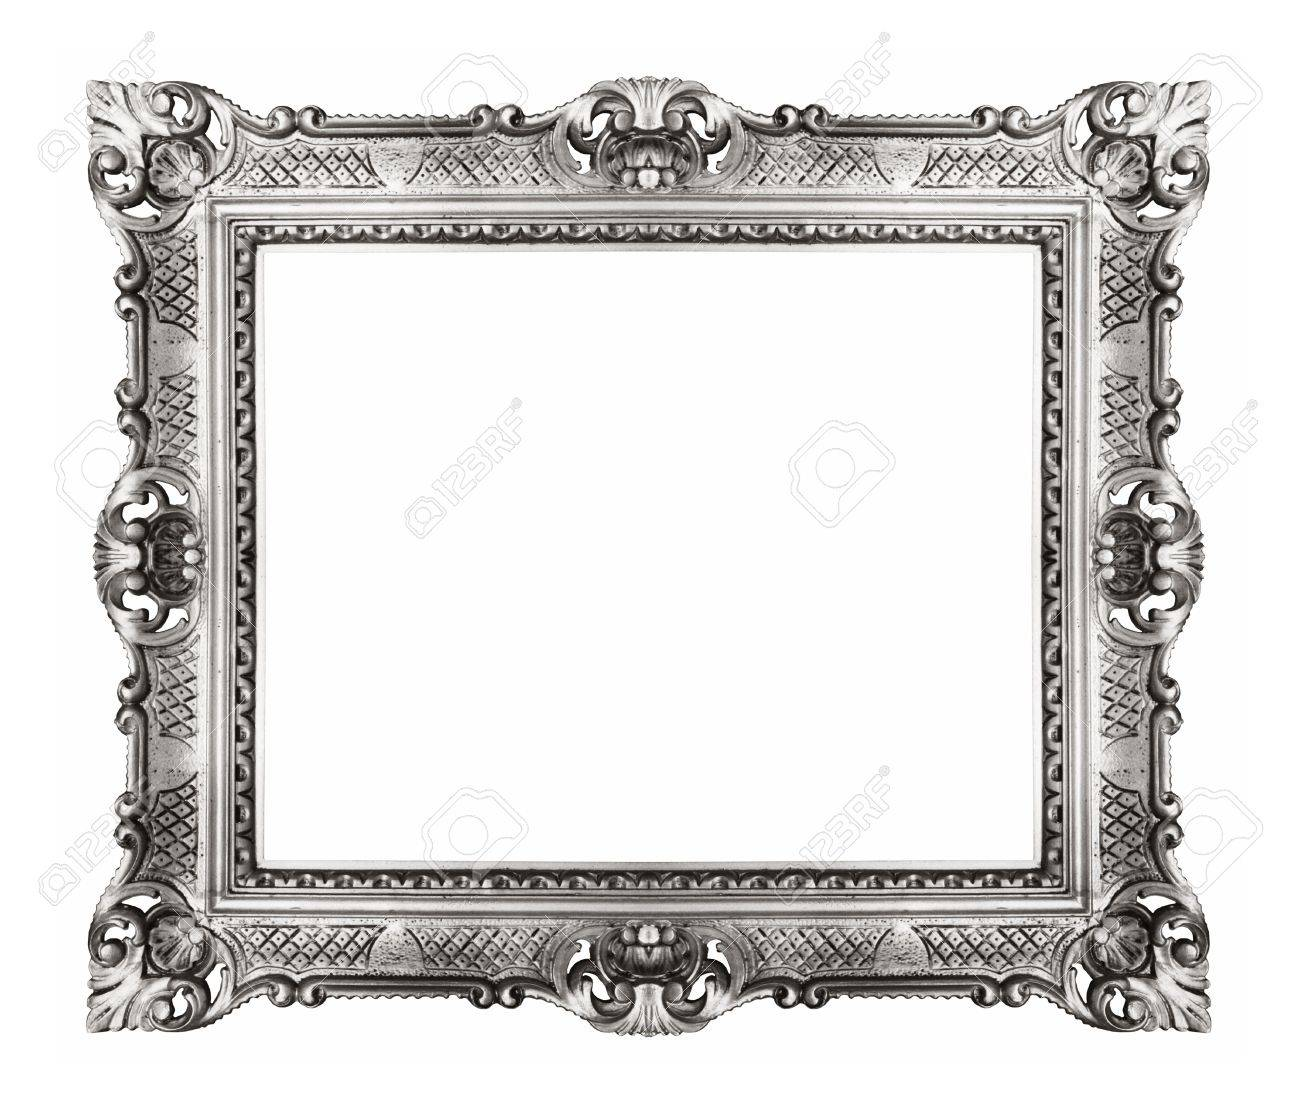 882146d3baa Silver vintage ornate frame Stock Photo - 16572512